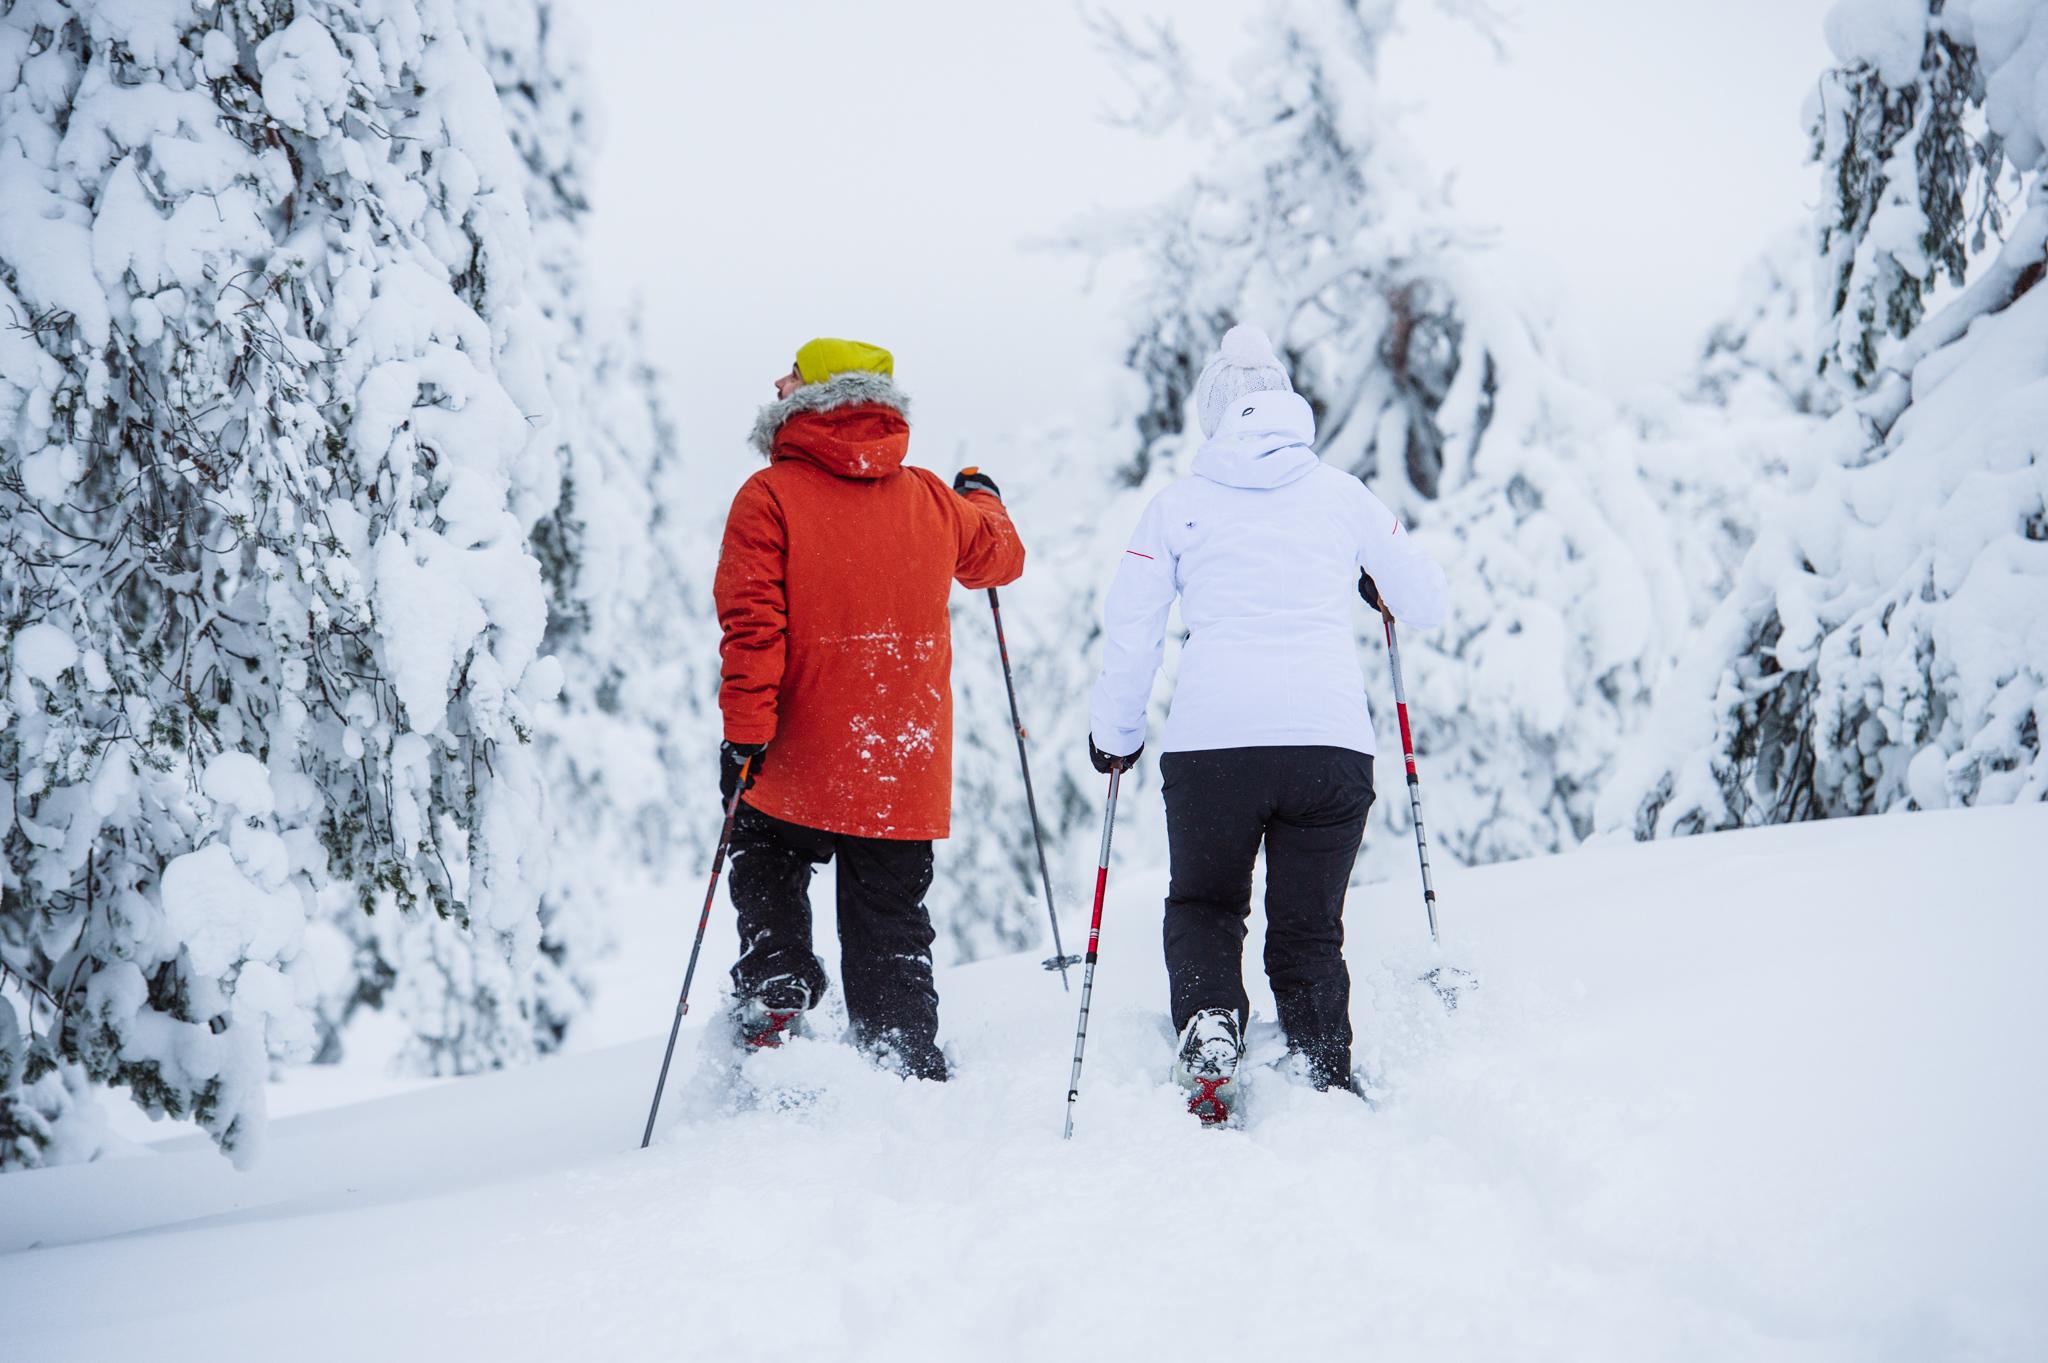 two people on snowshoe trip in deep snow